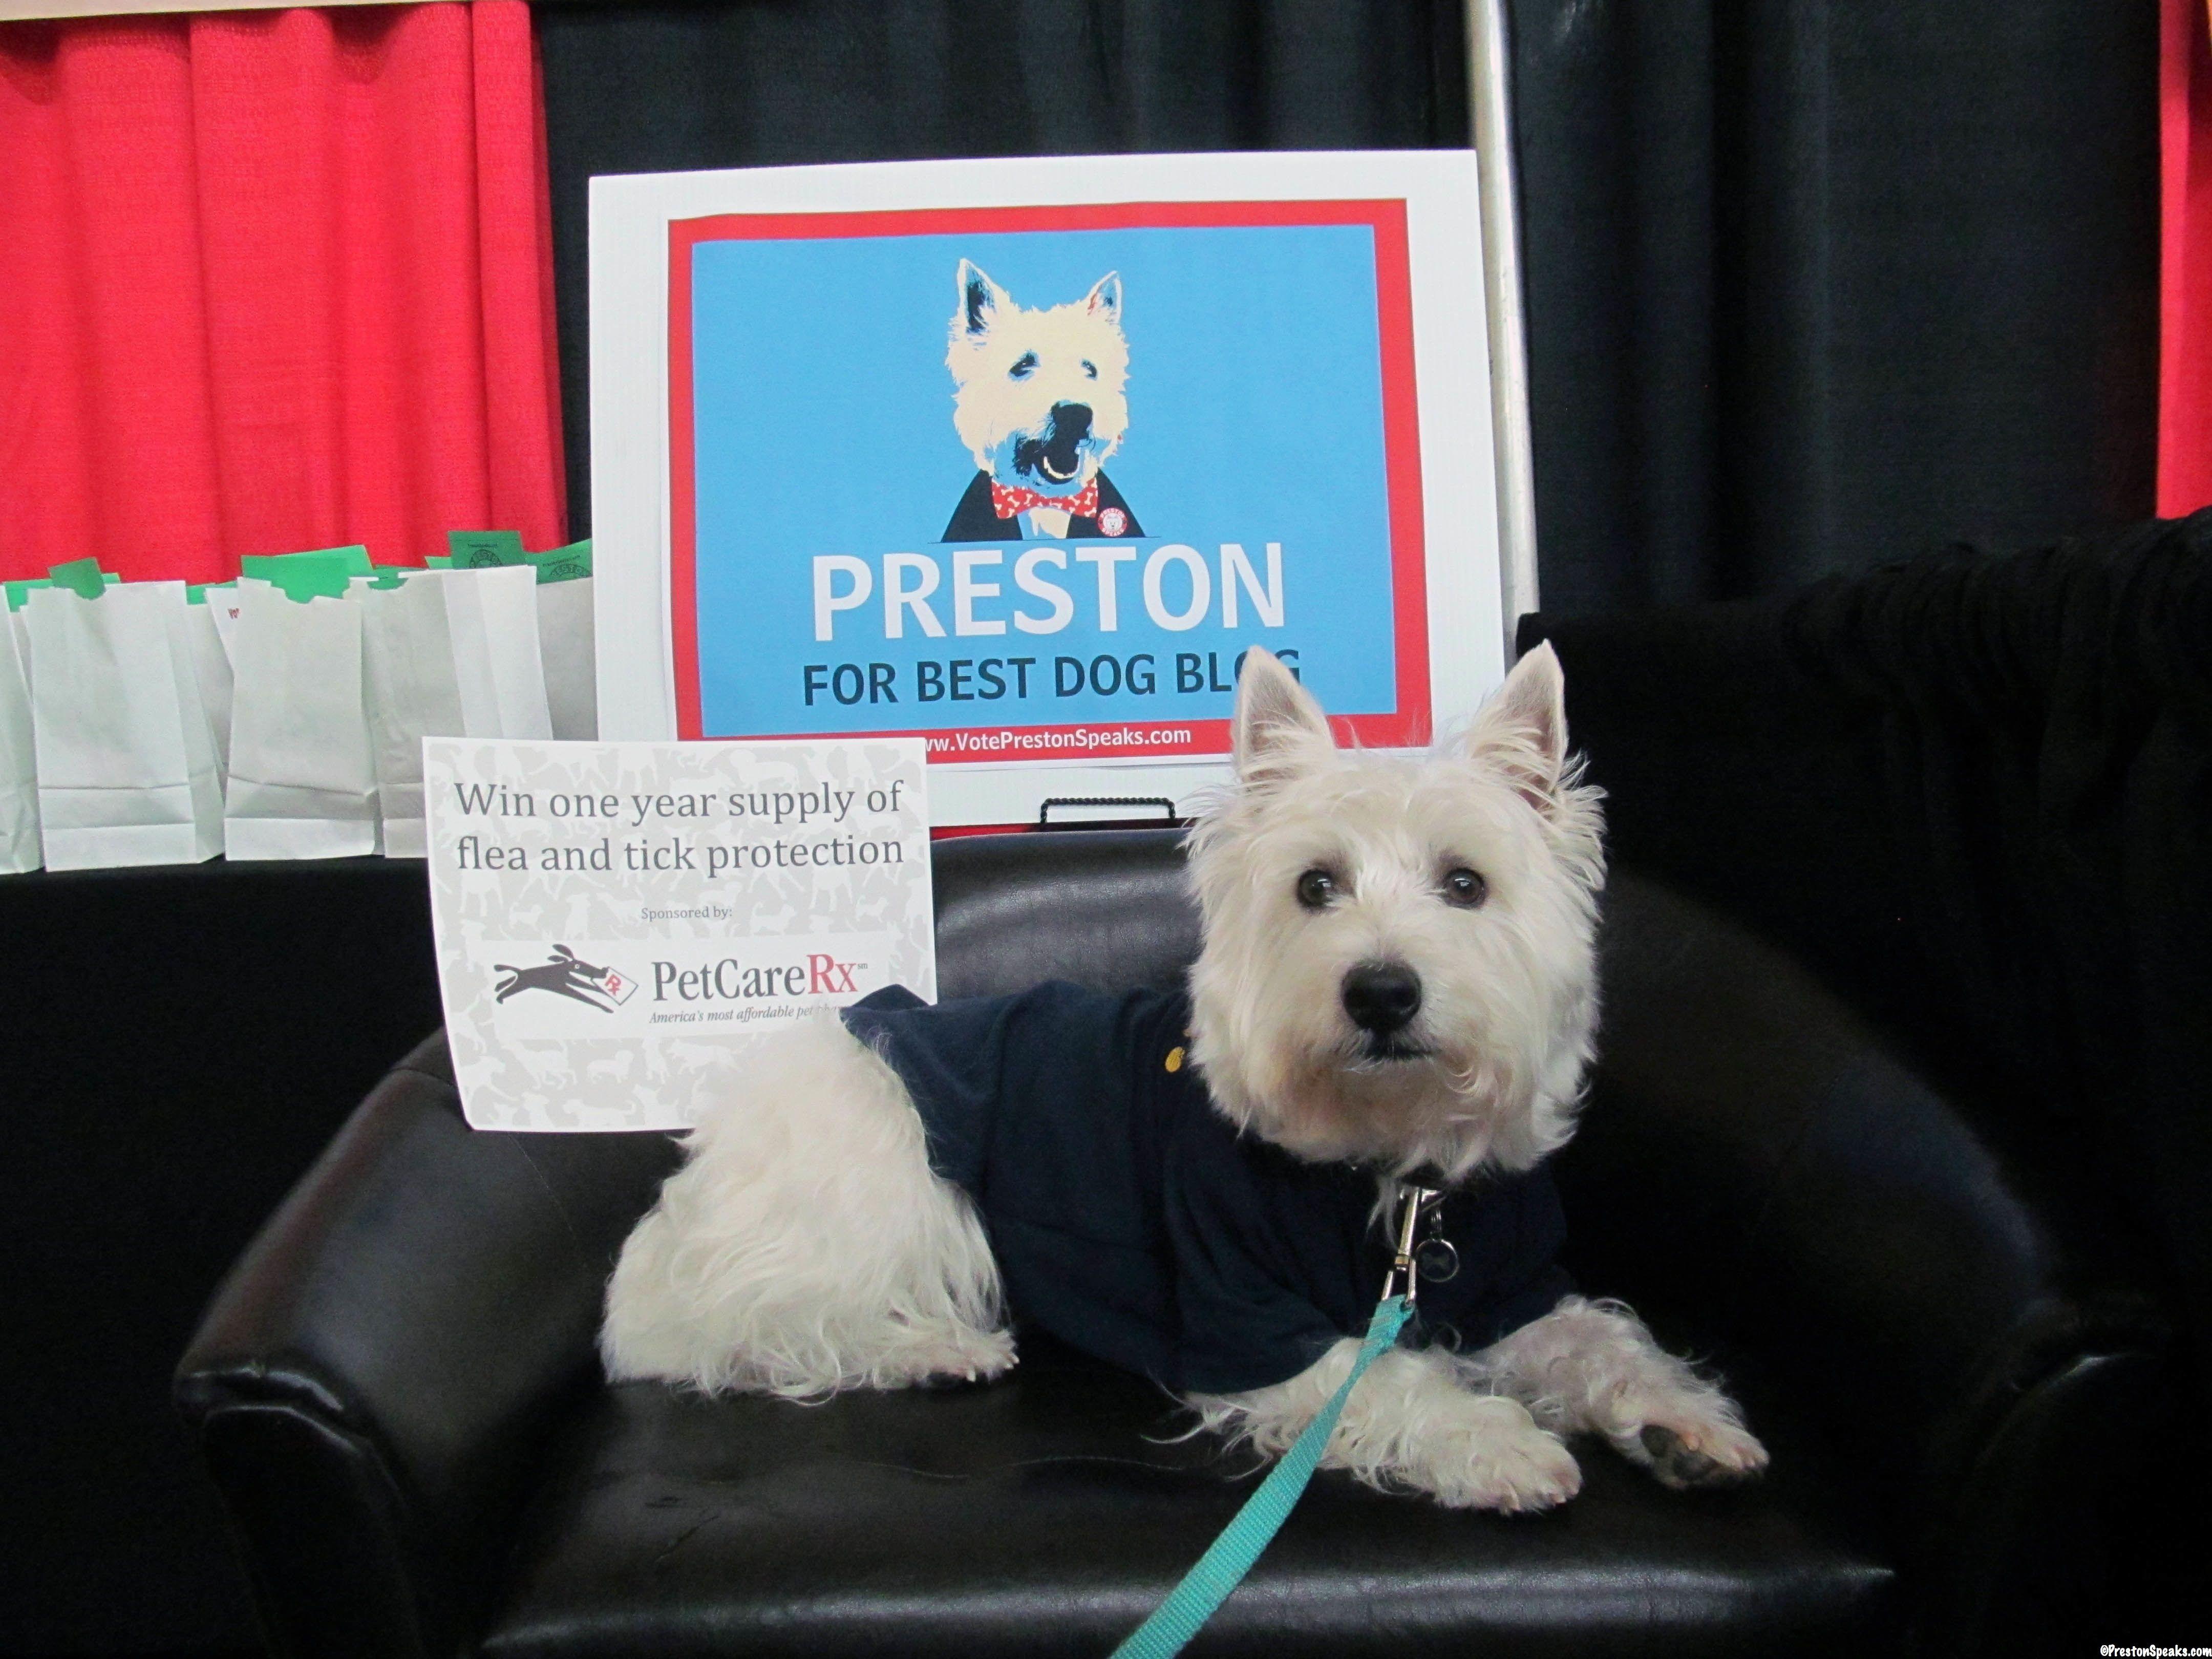 2013 Nashville Pet Expo @Diane Pet Expos  Coverage of the 2012-2014 Amazing Pet Expos from their Online Ambassador - Preston from PrestonSpeaks.com.  #dog #westie #westhighlandwhiteterrier #amazingpetexpo